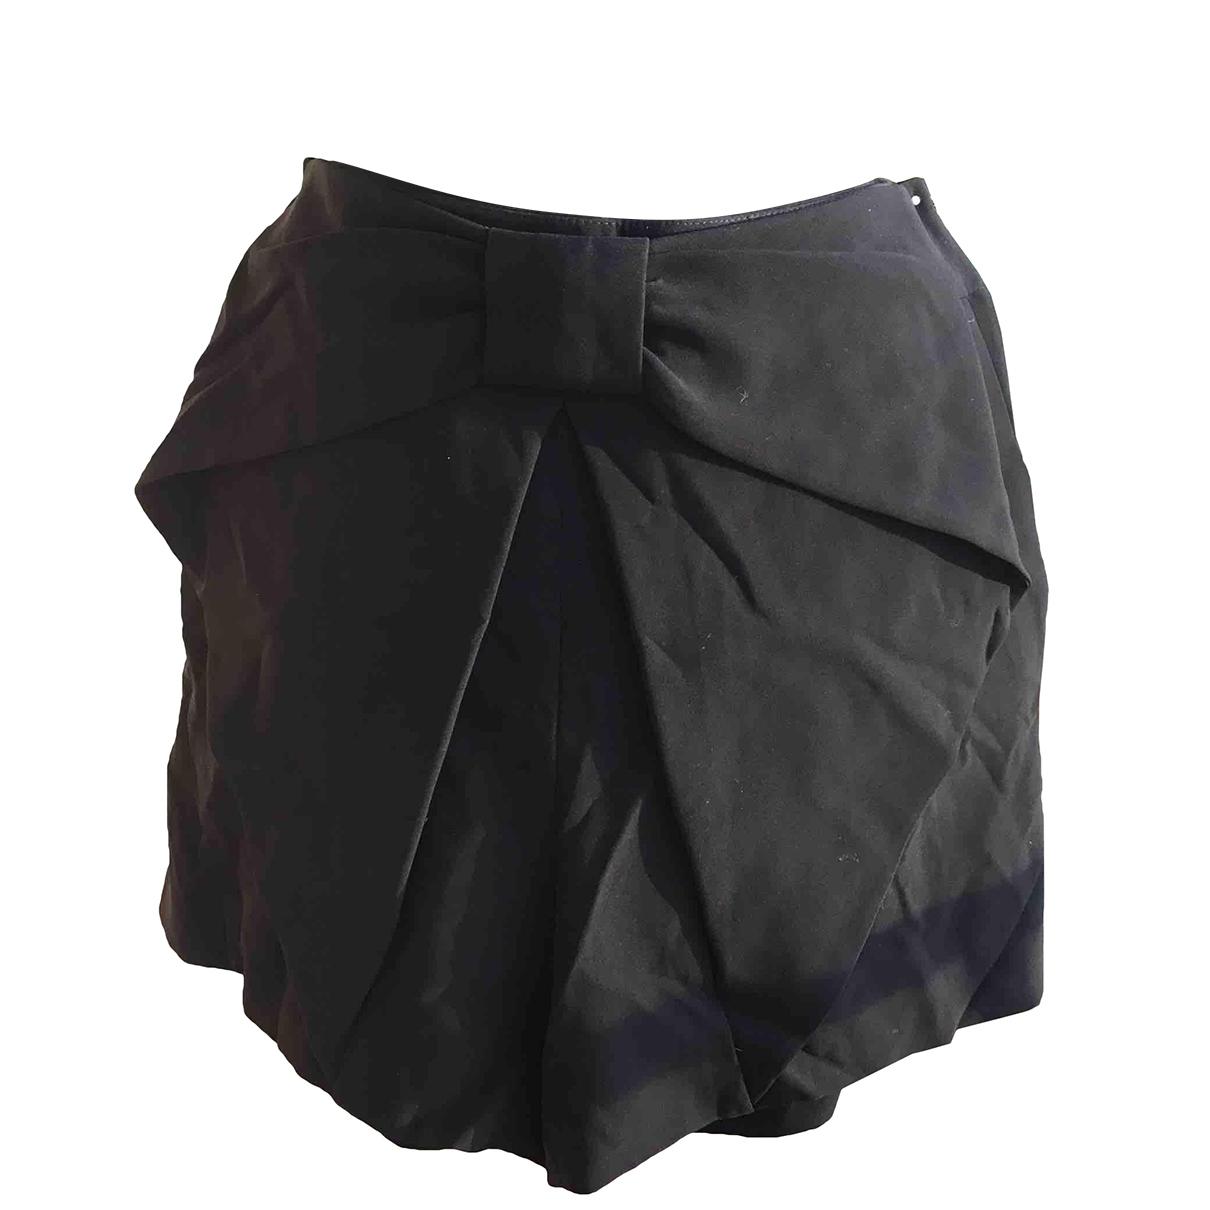 Claudie Pierlot \N Shorts in  Schwarz Synthetik